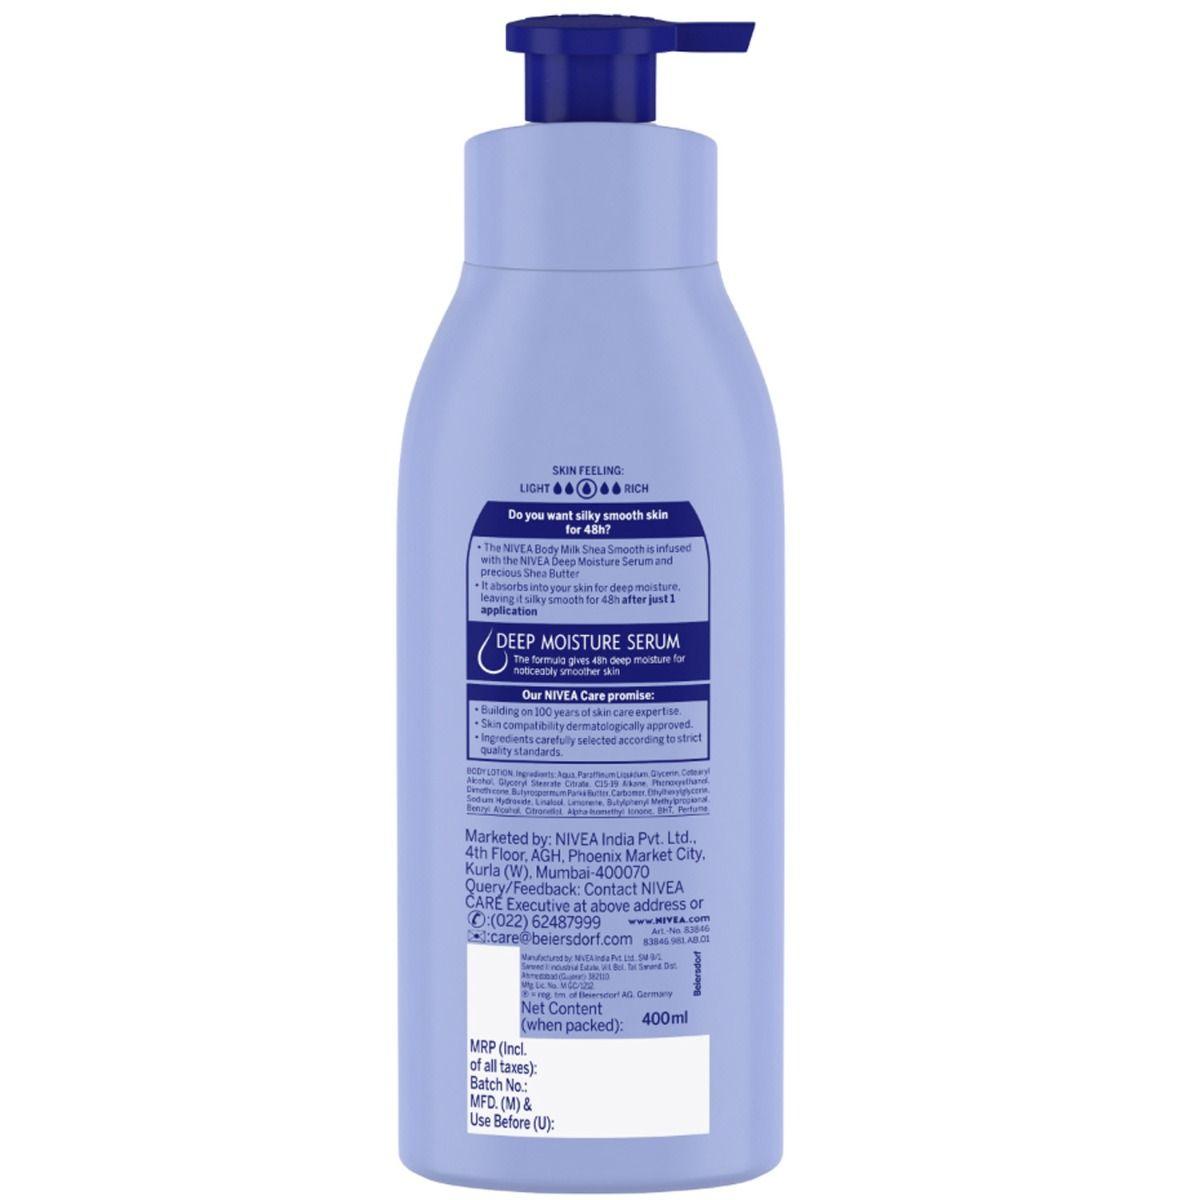 Nivea Shea Smooth Body Milk Moisturising Lotion, 400 ml, Pack of 1